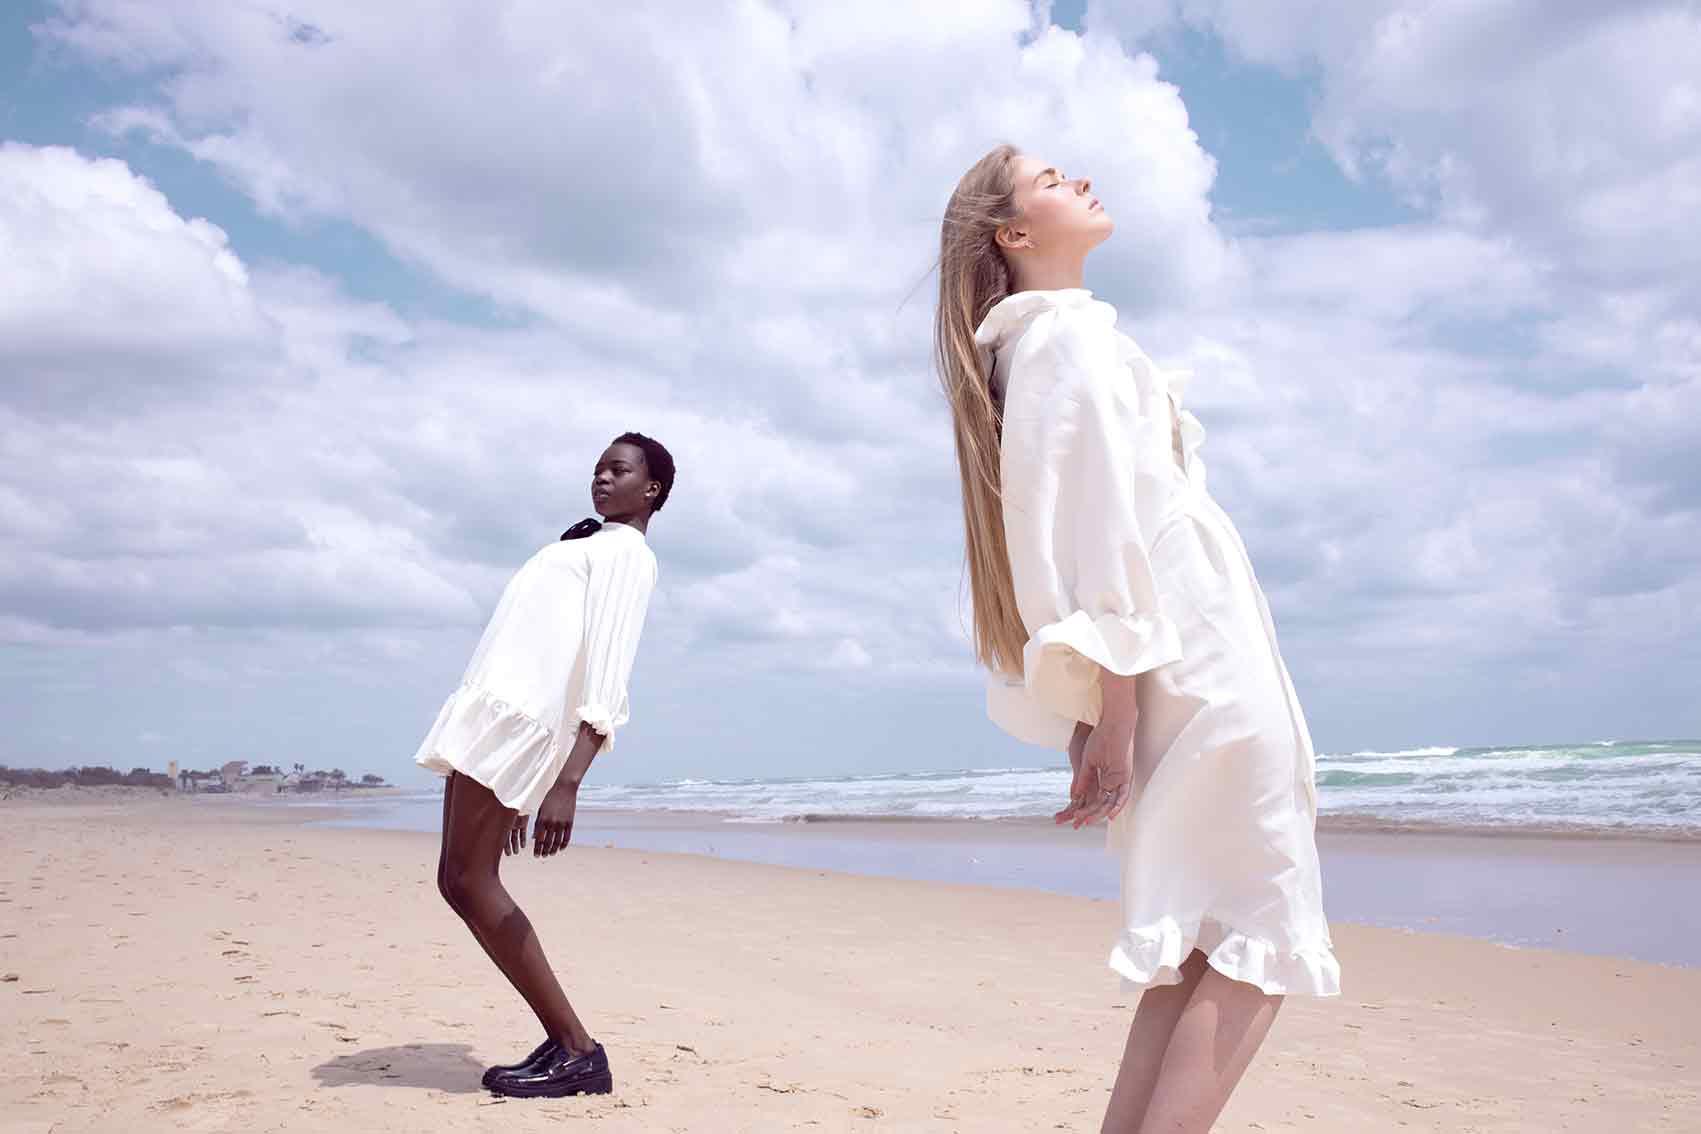 Photographer: YAEL BAR, Models: RITA AUGUSTINO, POLINA RIA, Makeup: AREEG GH, Stylist: BAR FRIEDMAN, Designers: BOOBA MACHO, MONALIZABETH-אופנה